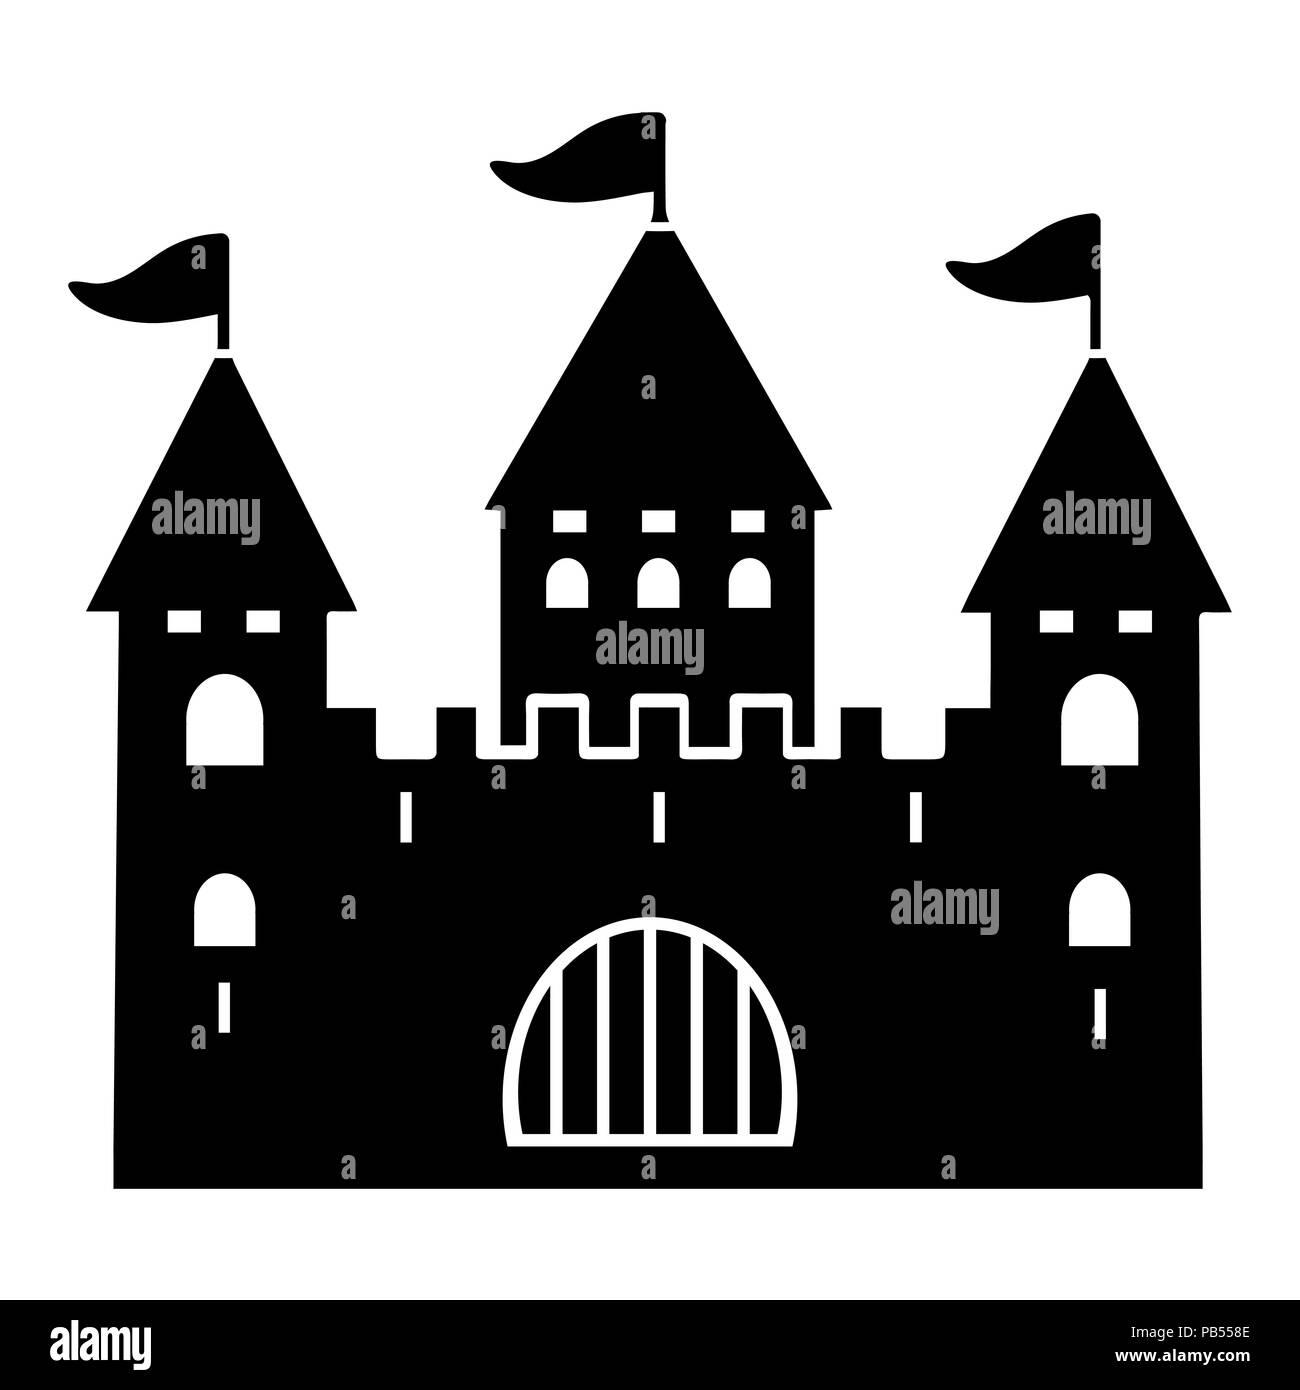 Castle silhouette, flat icon, logo, outline, contour, vector ... on magic kingdom outline, girl outline, village outline, people outline, hospital outline, aqueduct outline, church outline, shop outline, stone outline, zoo outline, apartment outline, coliseum outline, forbidden city outline, bridge outline, beach outline, art outline, pagoda outline, history outline, car outline, temple outline,